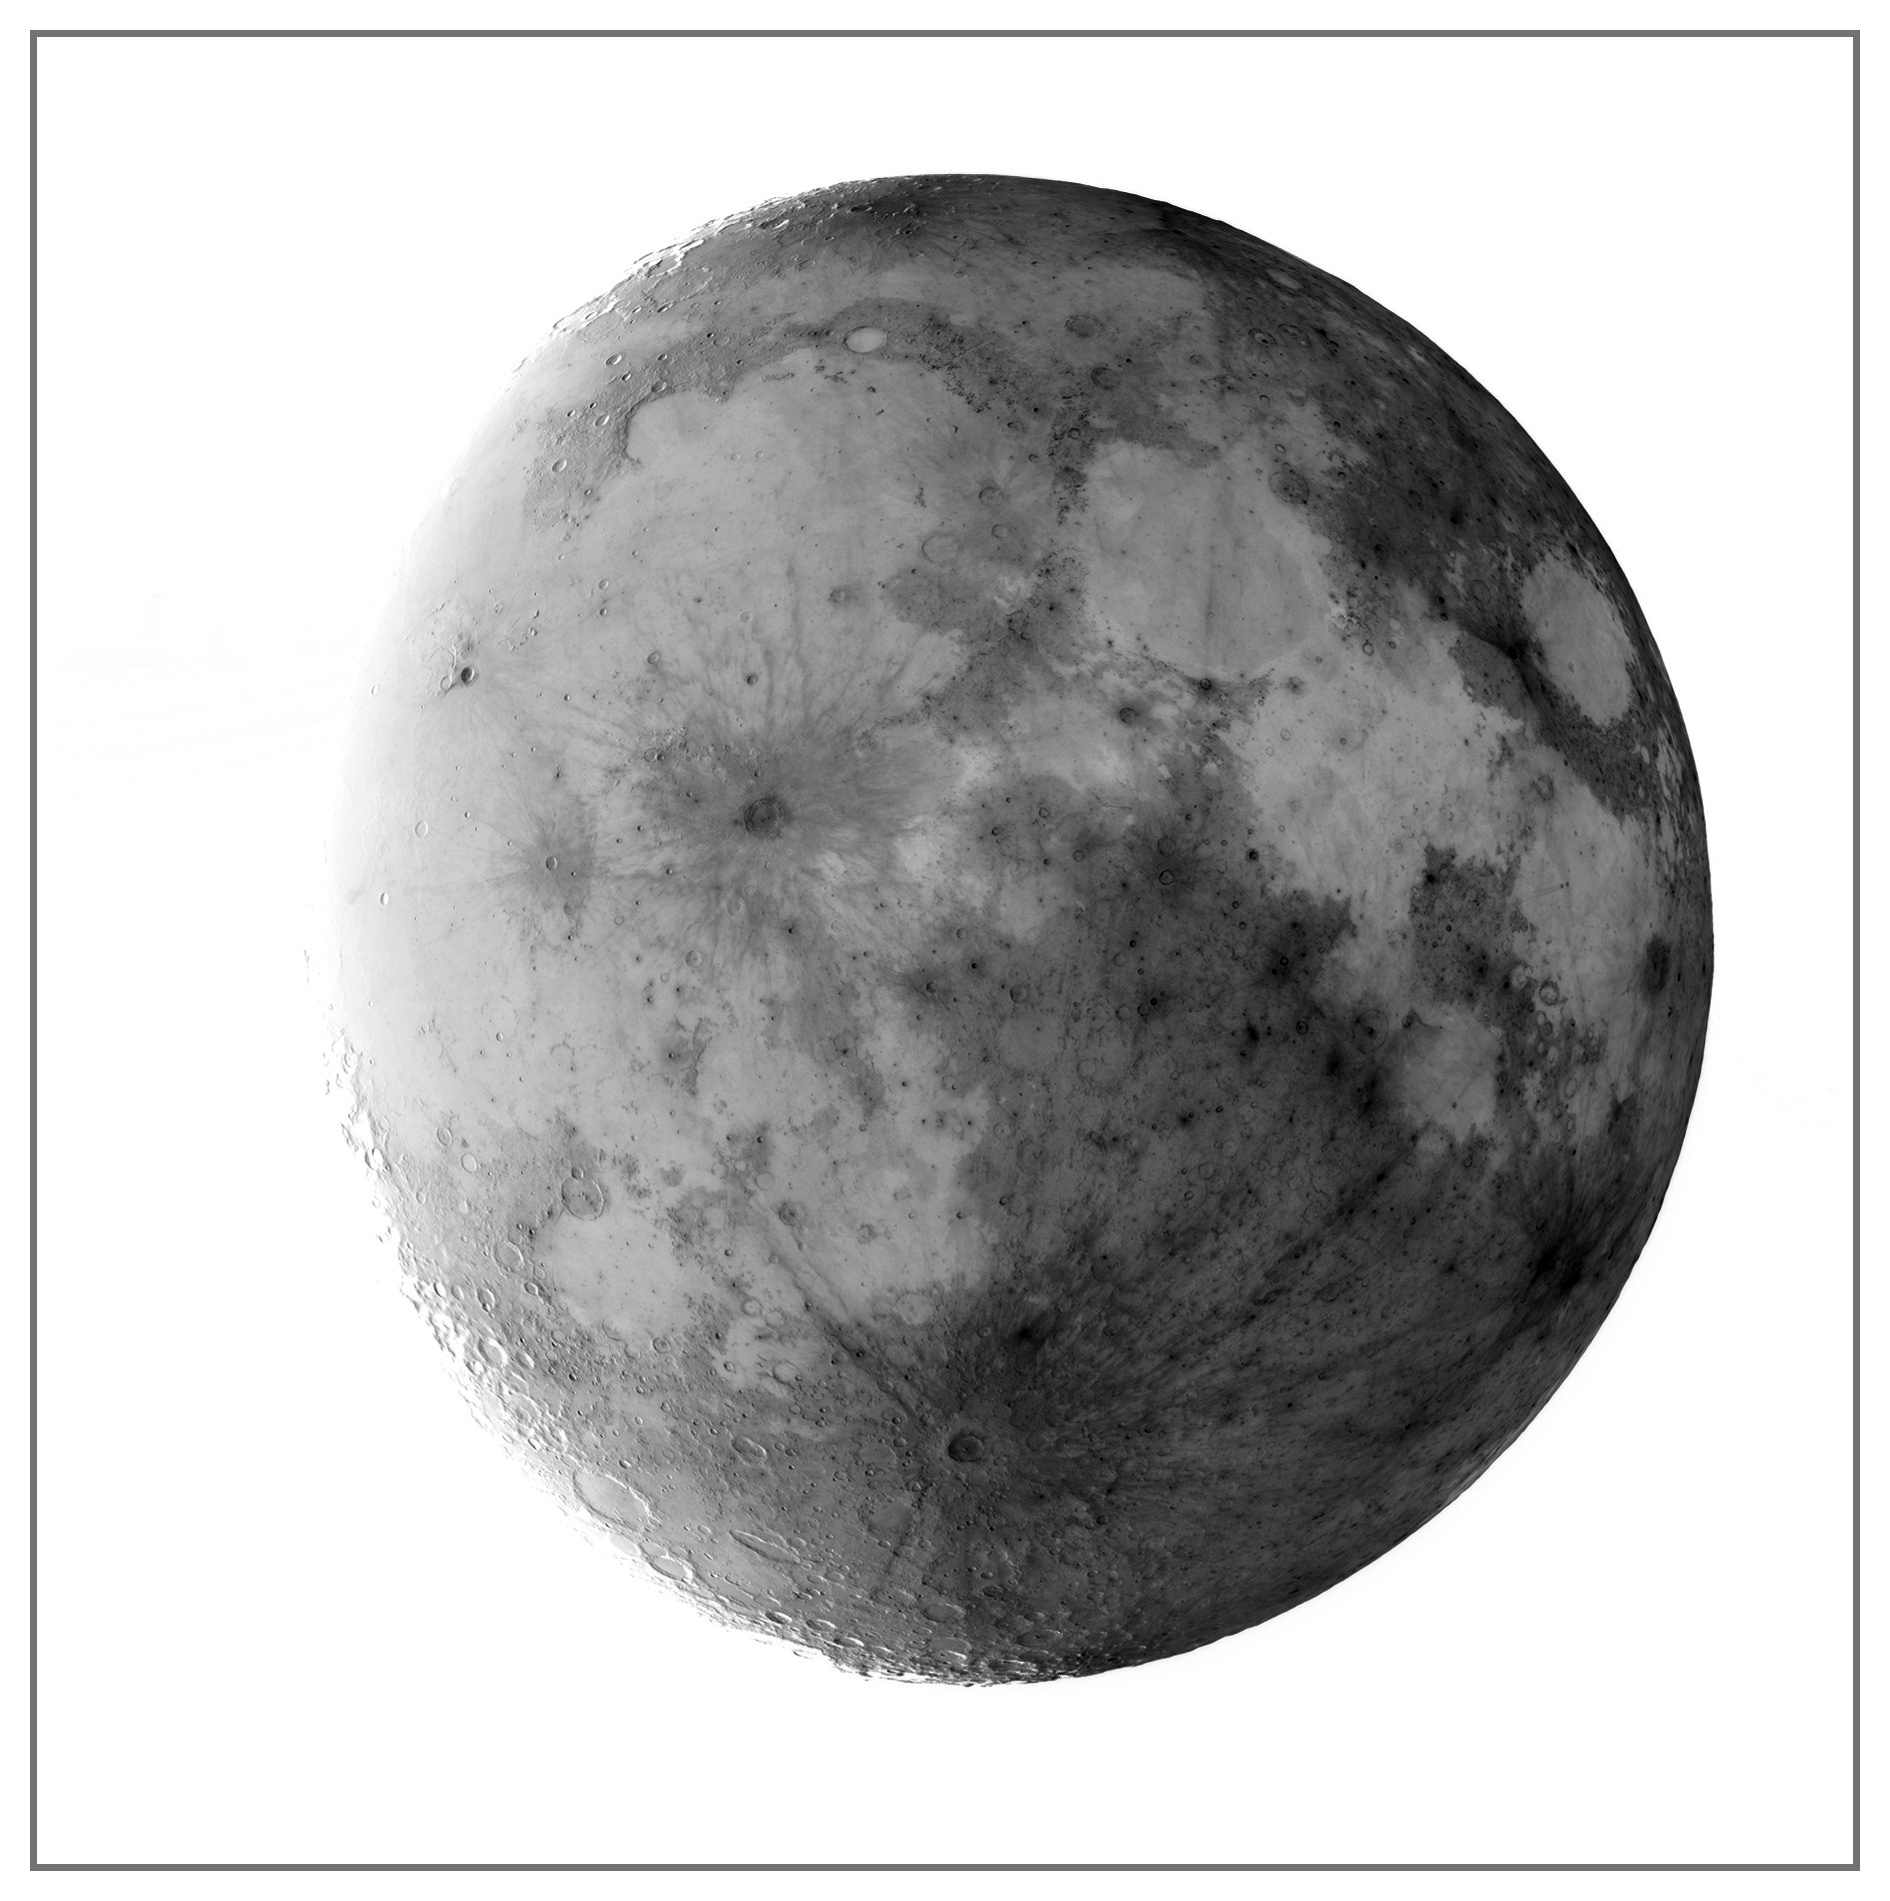 5e3ef52cc4b49_Moon_212734_060220_ZWOASI224MC_RGB_AS_P15_lapl3_ap942_stitchbasemonoinv.jpg.f01168e484937a76d2d3d4abb1df909f.jpg